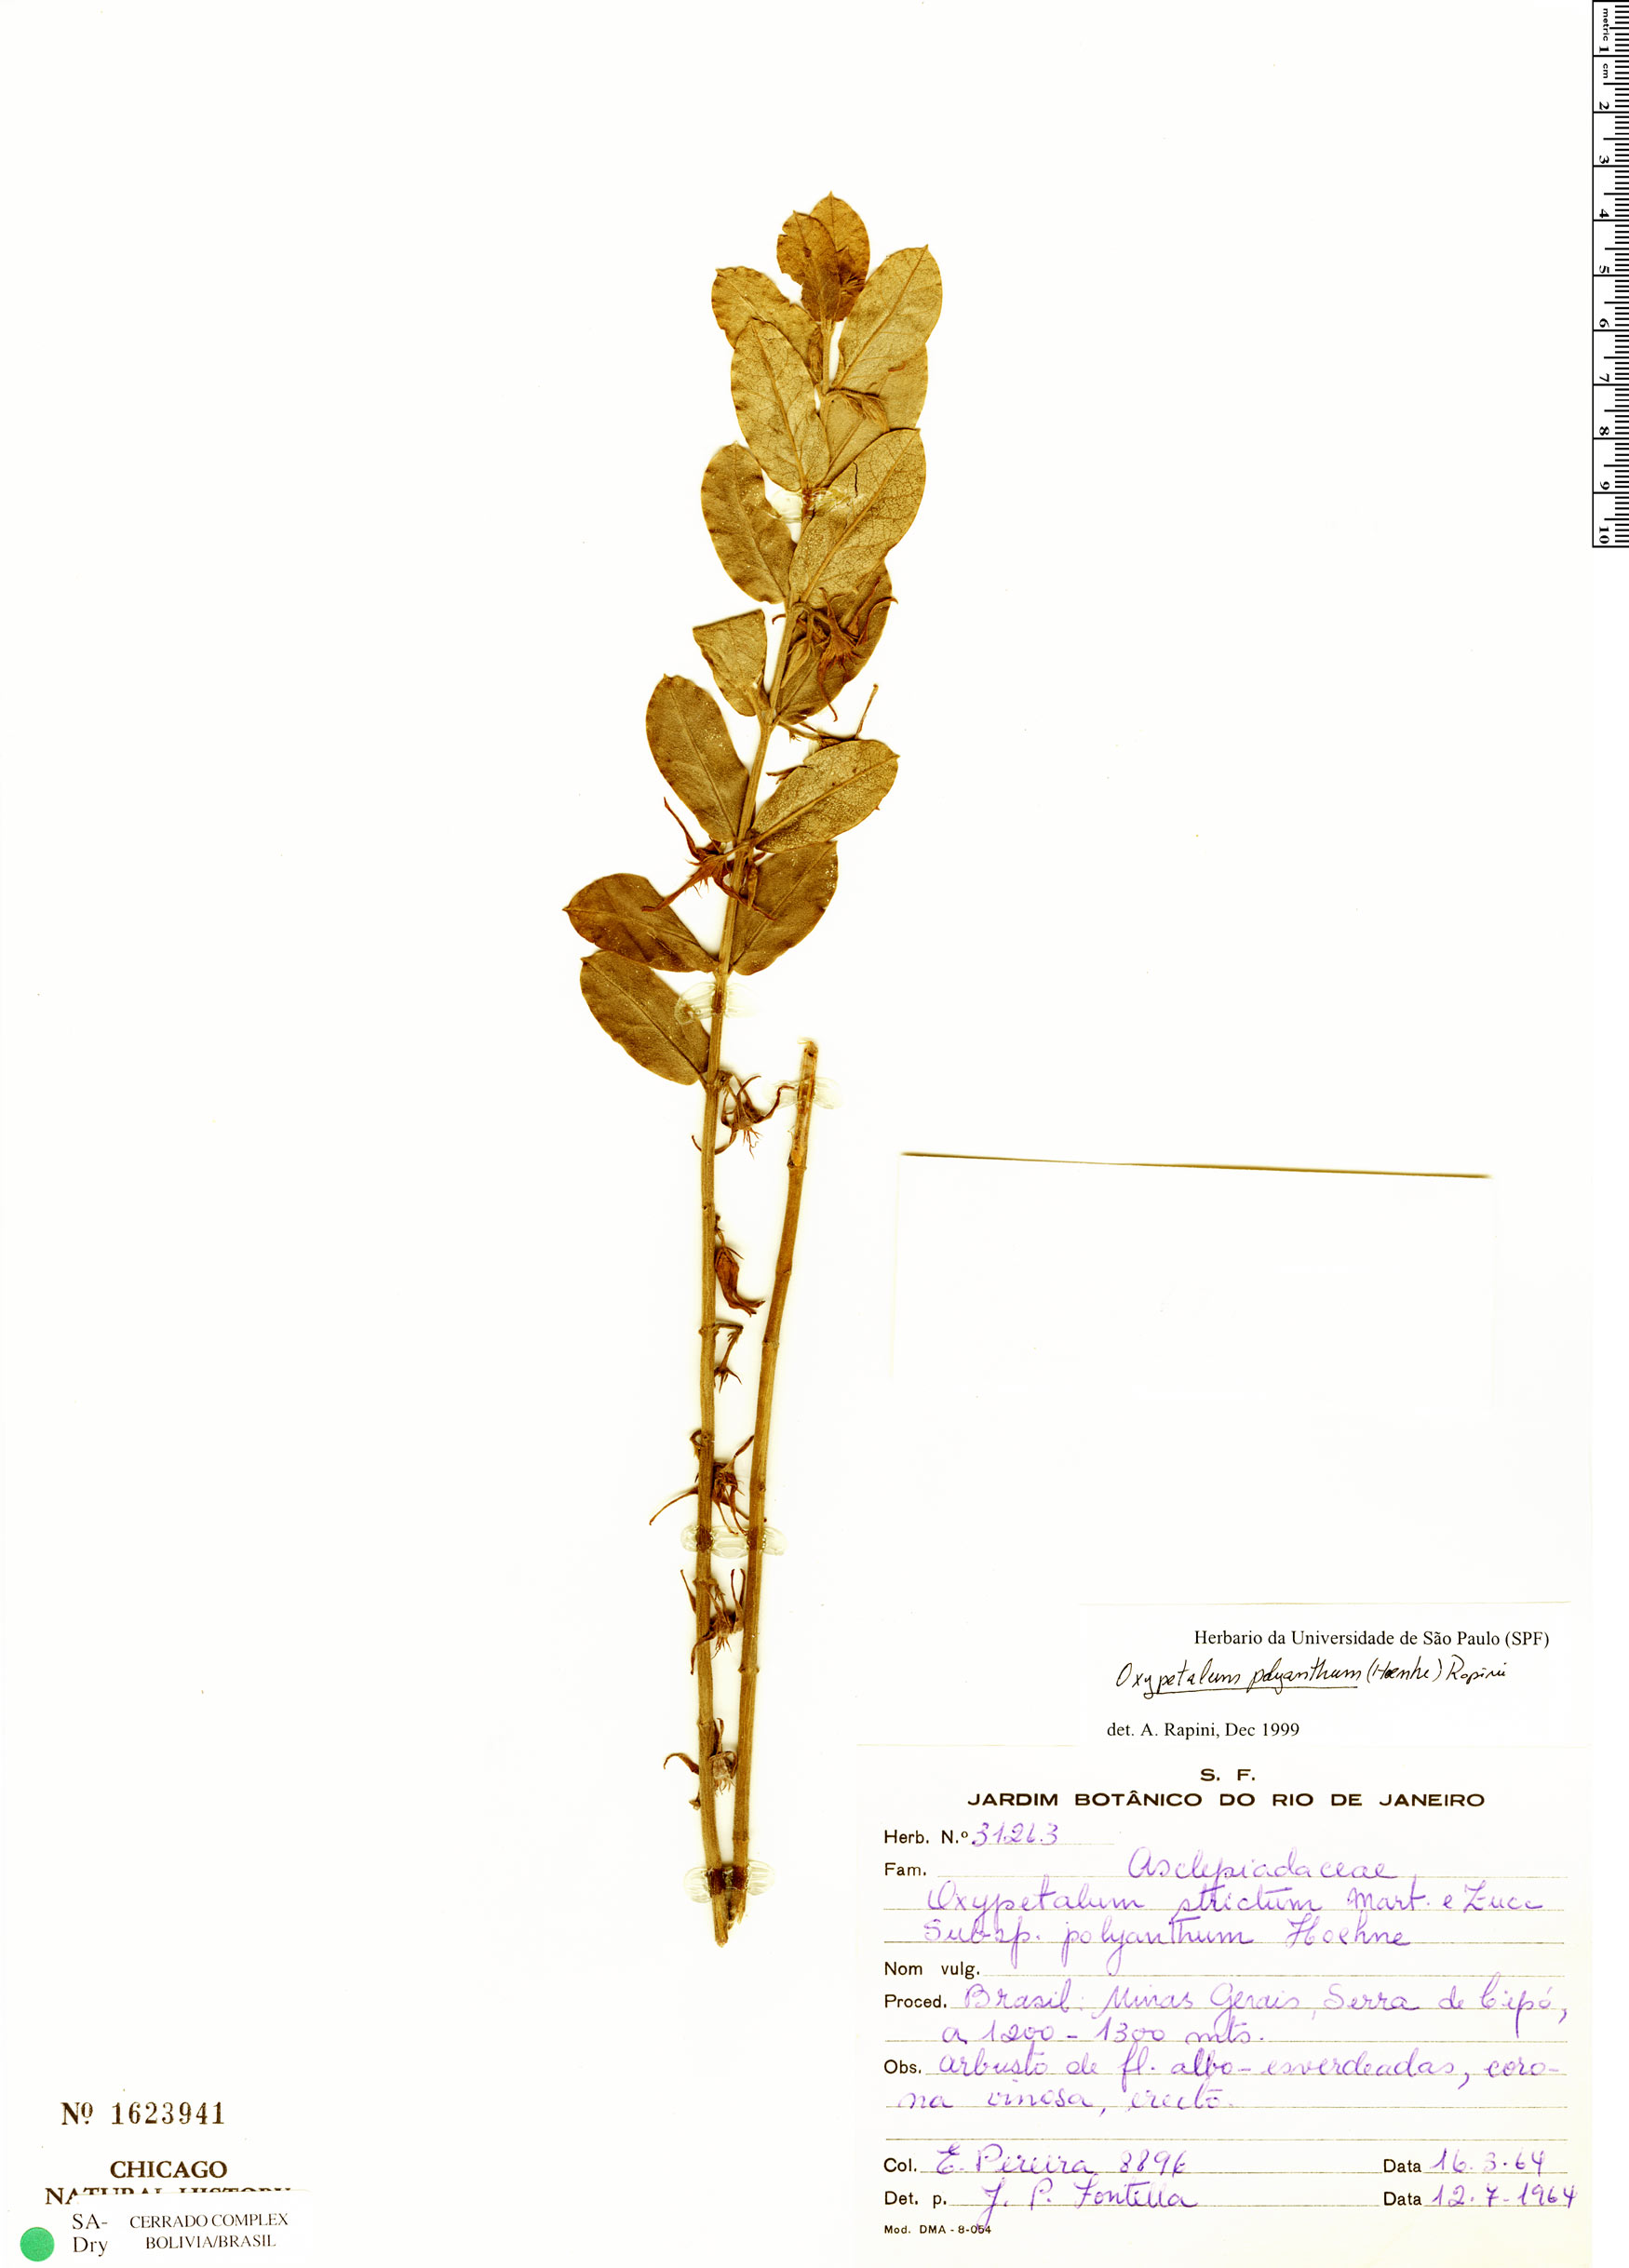 Specimen: Oxypetalum polyanthum